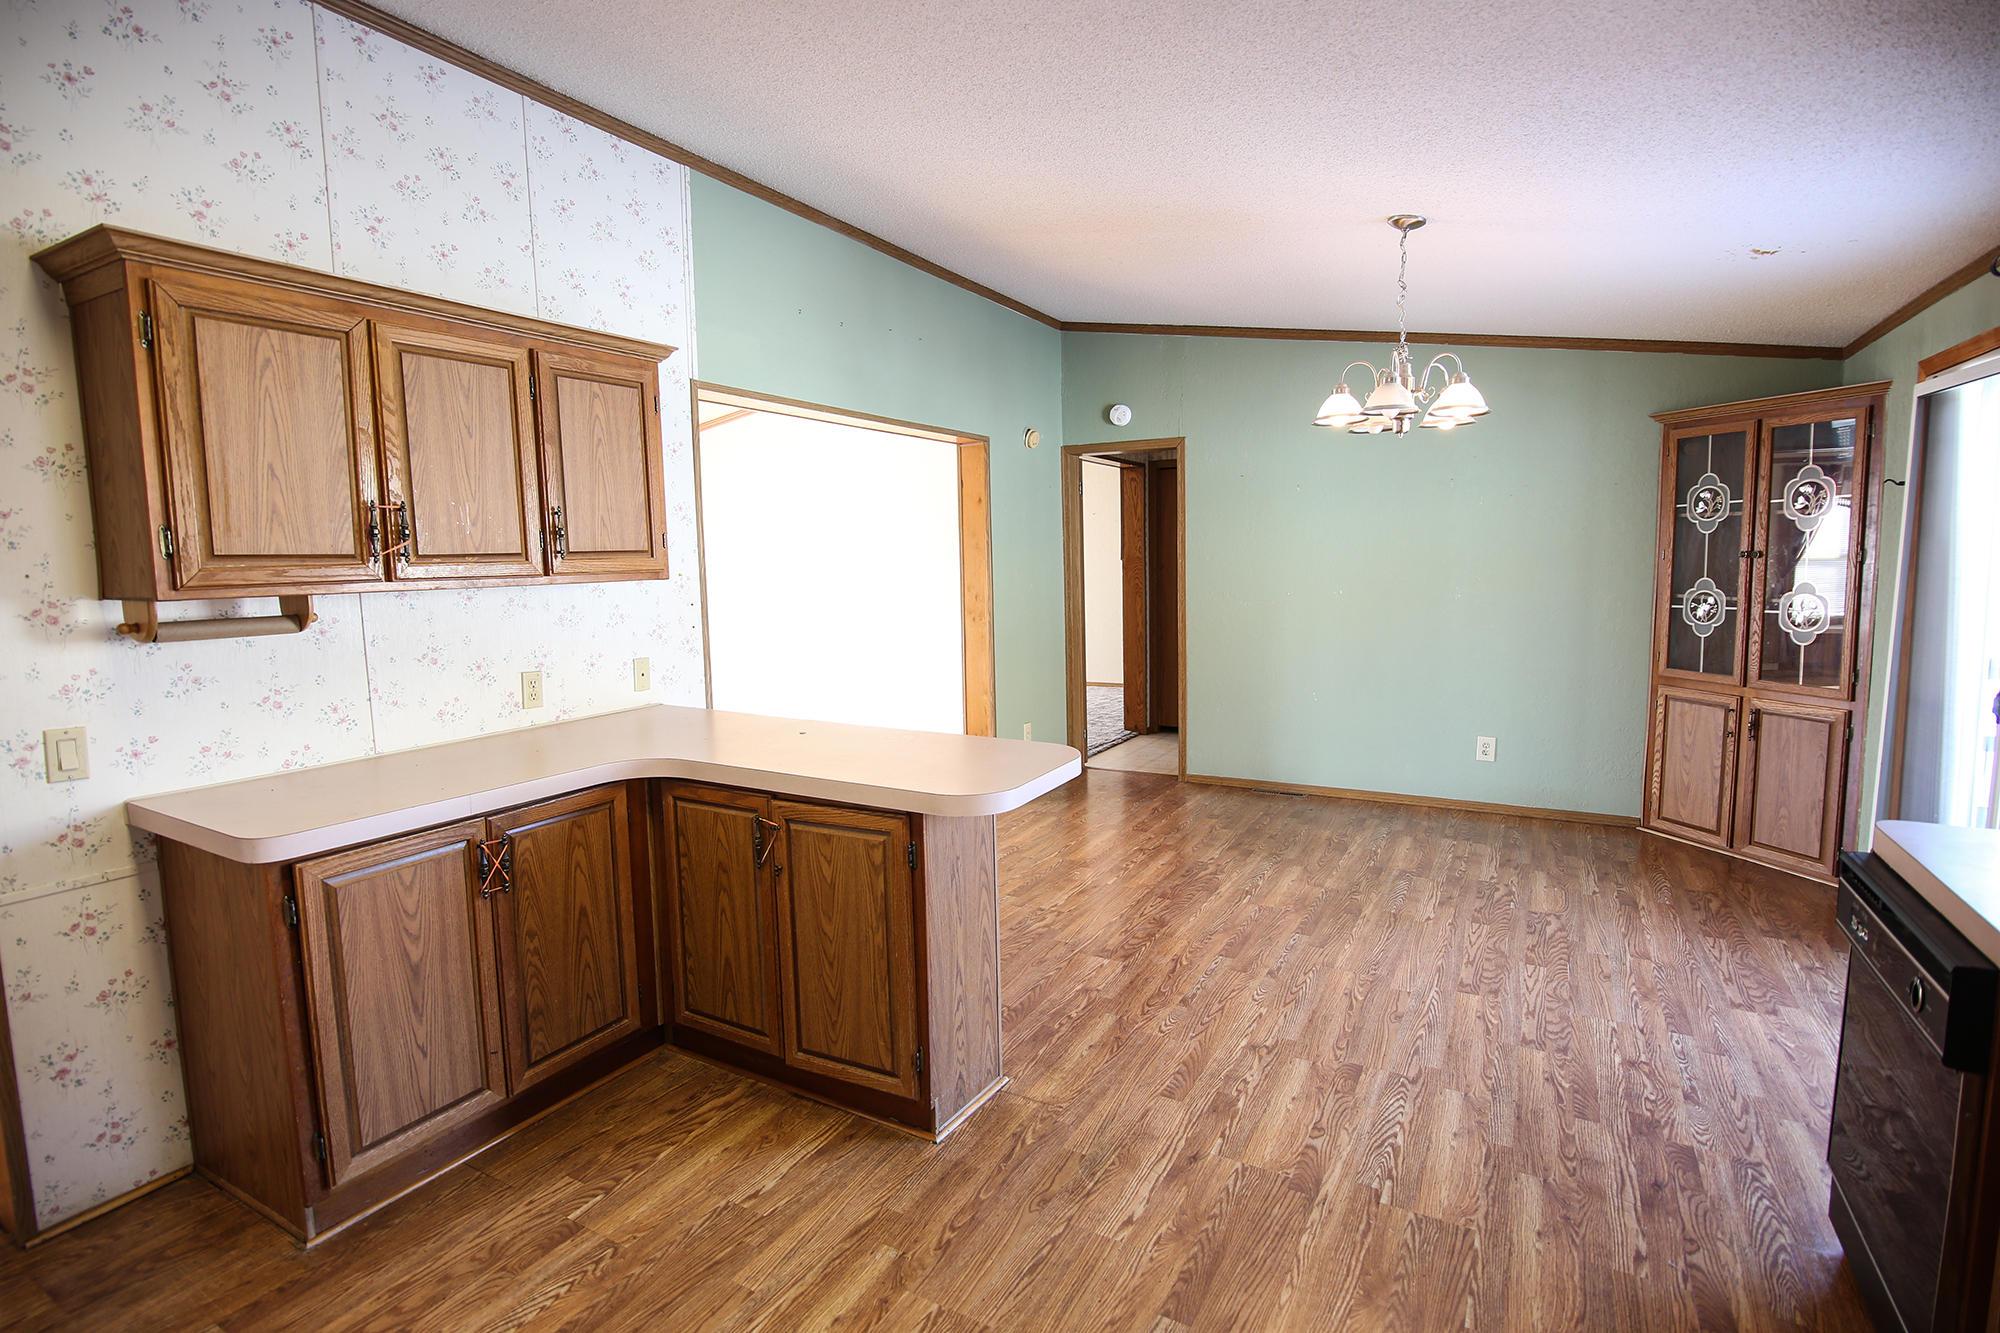 697 E US HWY 14, Sheridan, Wyoming 82801, 3 Bedrooms Bedrooms, ,2 BathroomsBathrooms,Ranch,For Sale,US HWY 14,18-1209